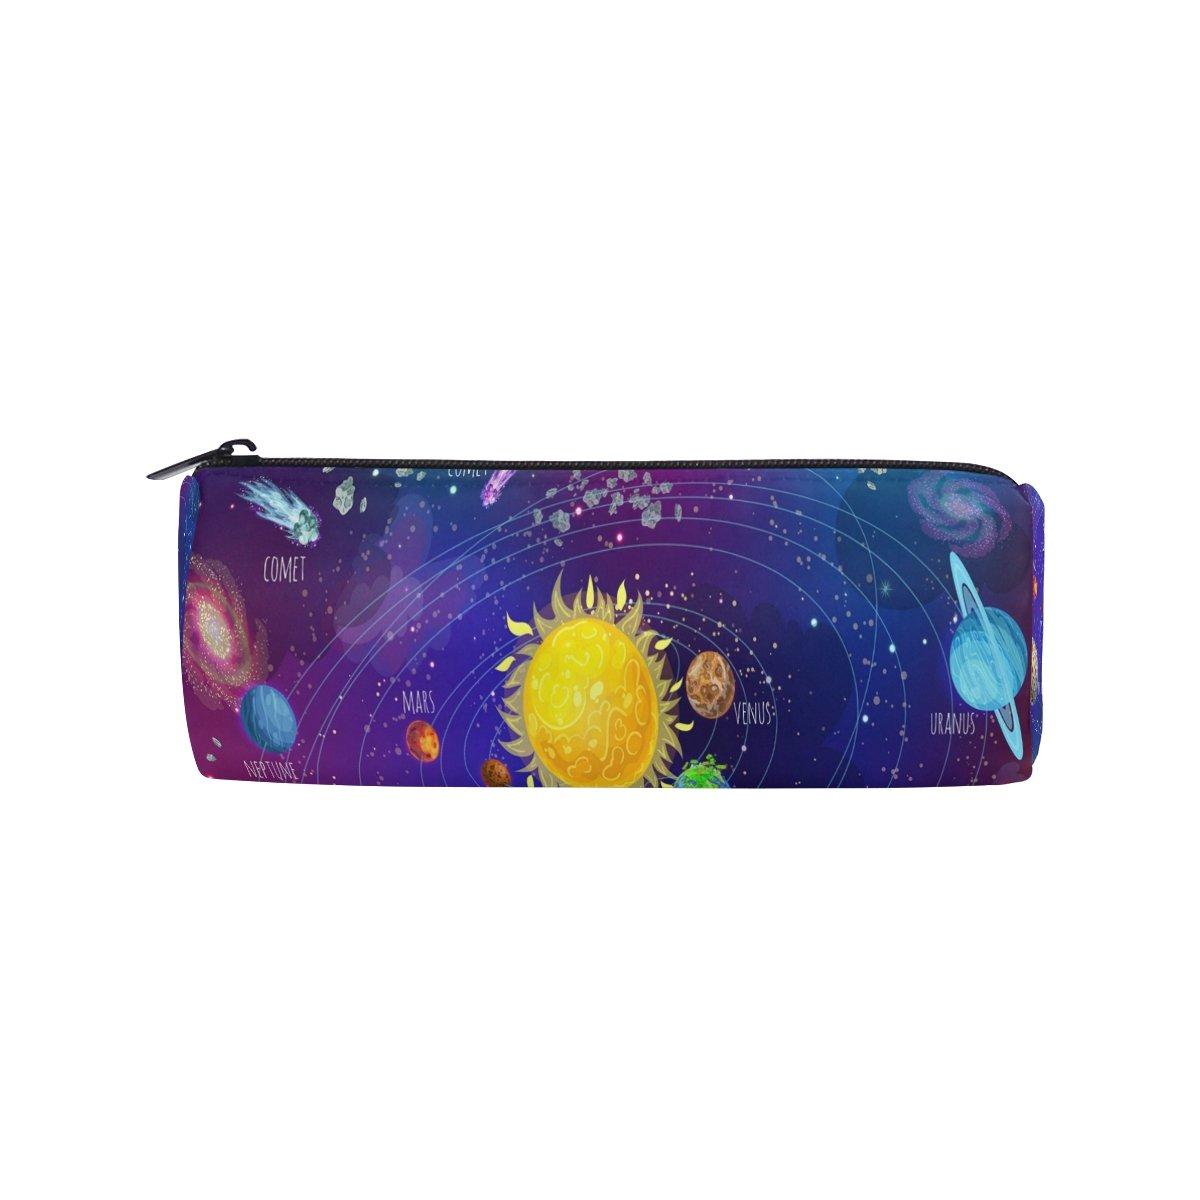 ShineSnow Cartoon Solar System Scientific Pencil Pen Bag Case, Galaxy Sun Moon Earth Student Office College Middle School High School Large Storage Pouch Holder Box Organizer